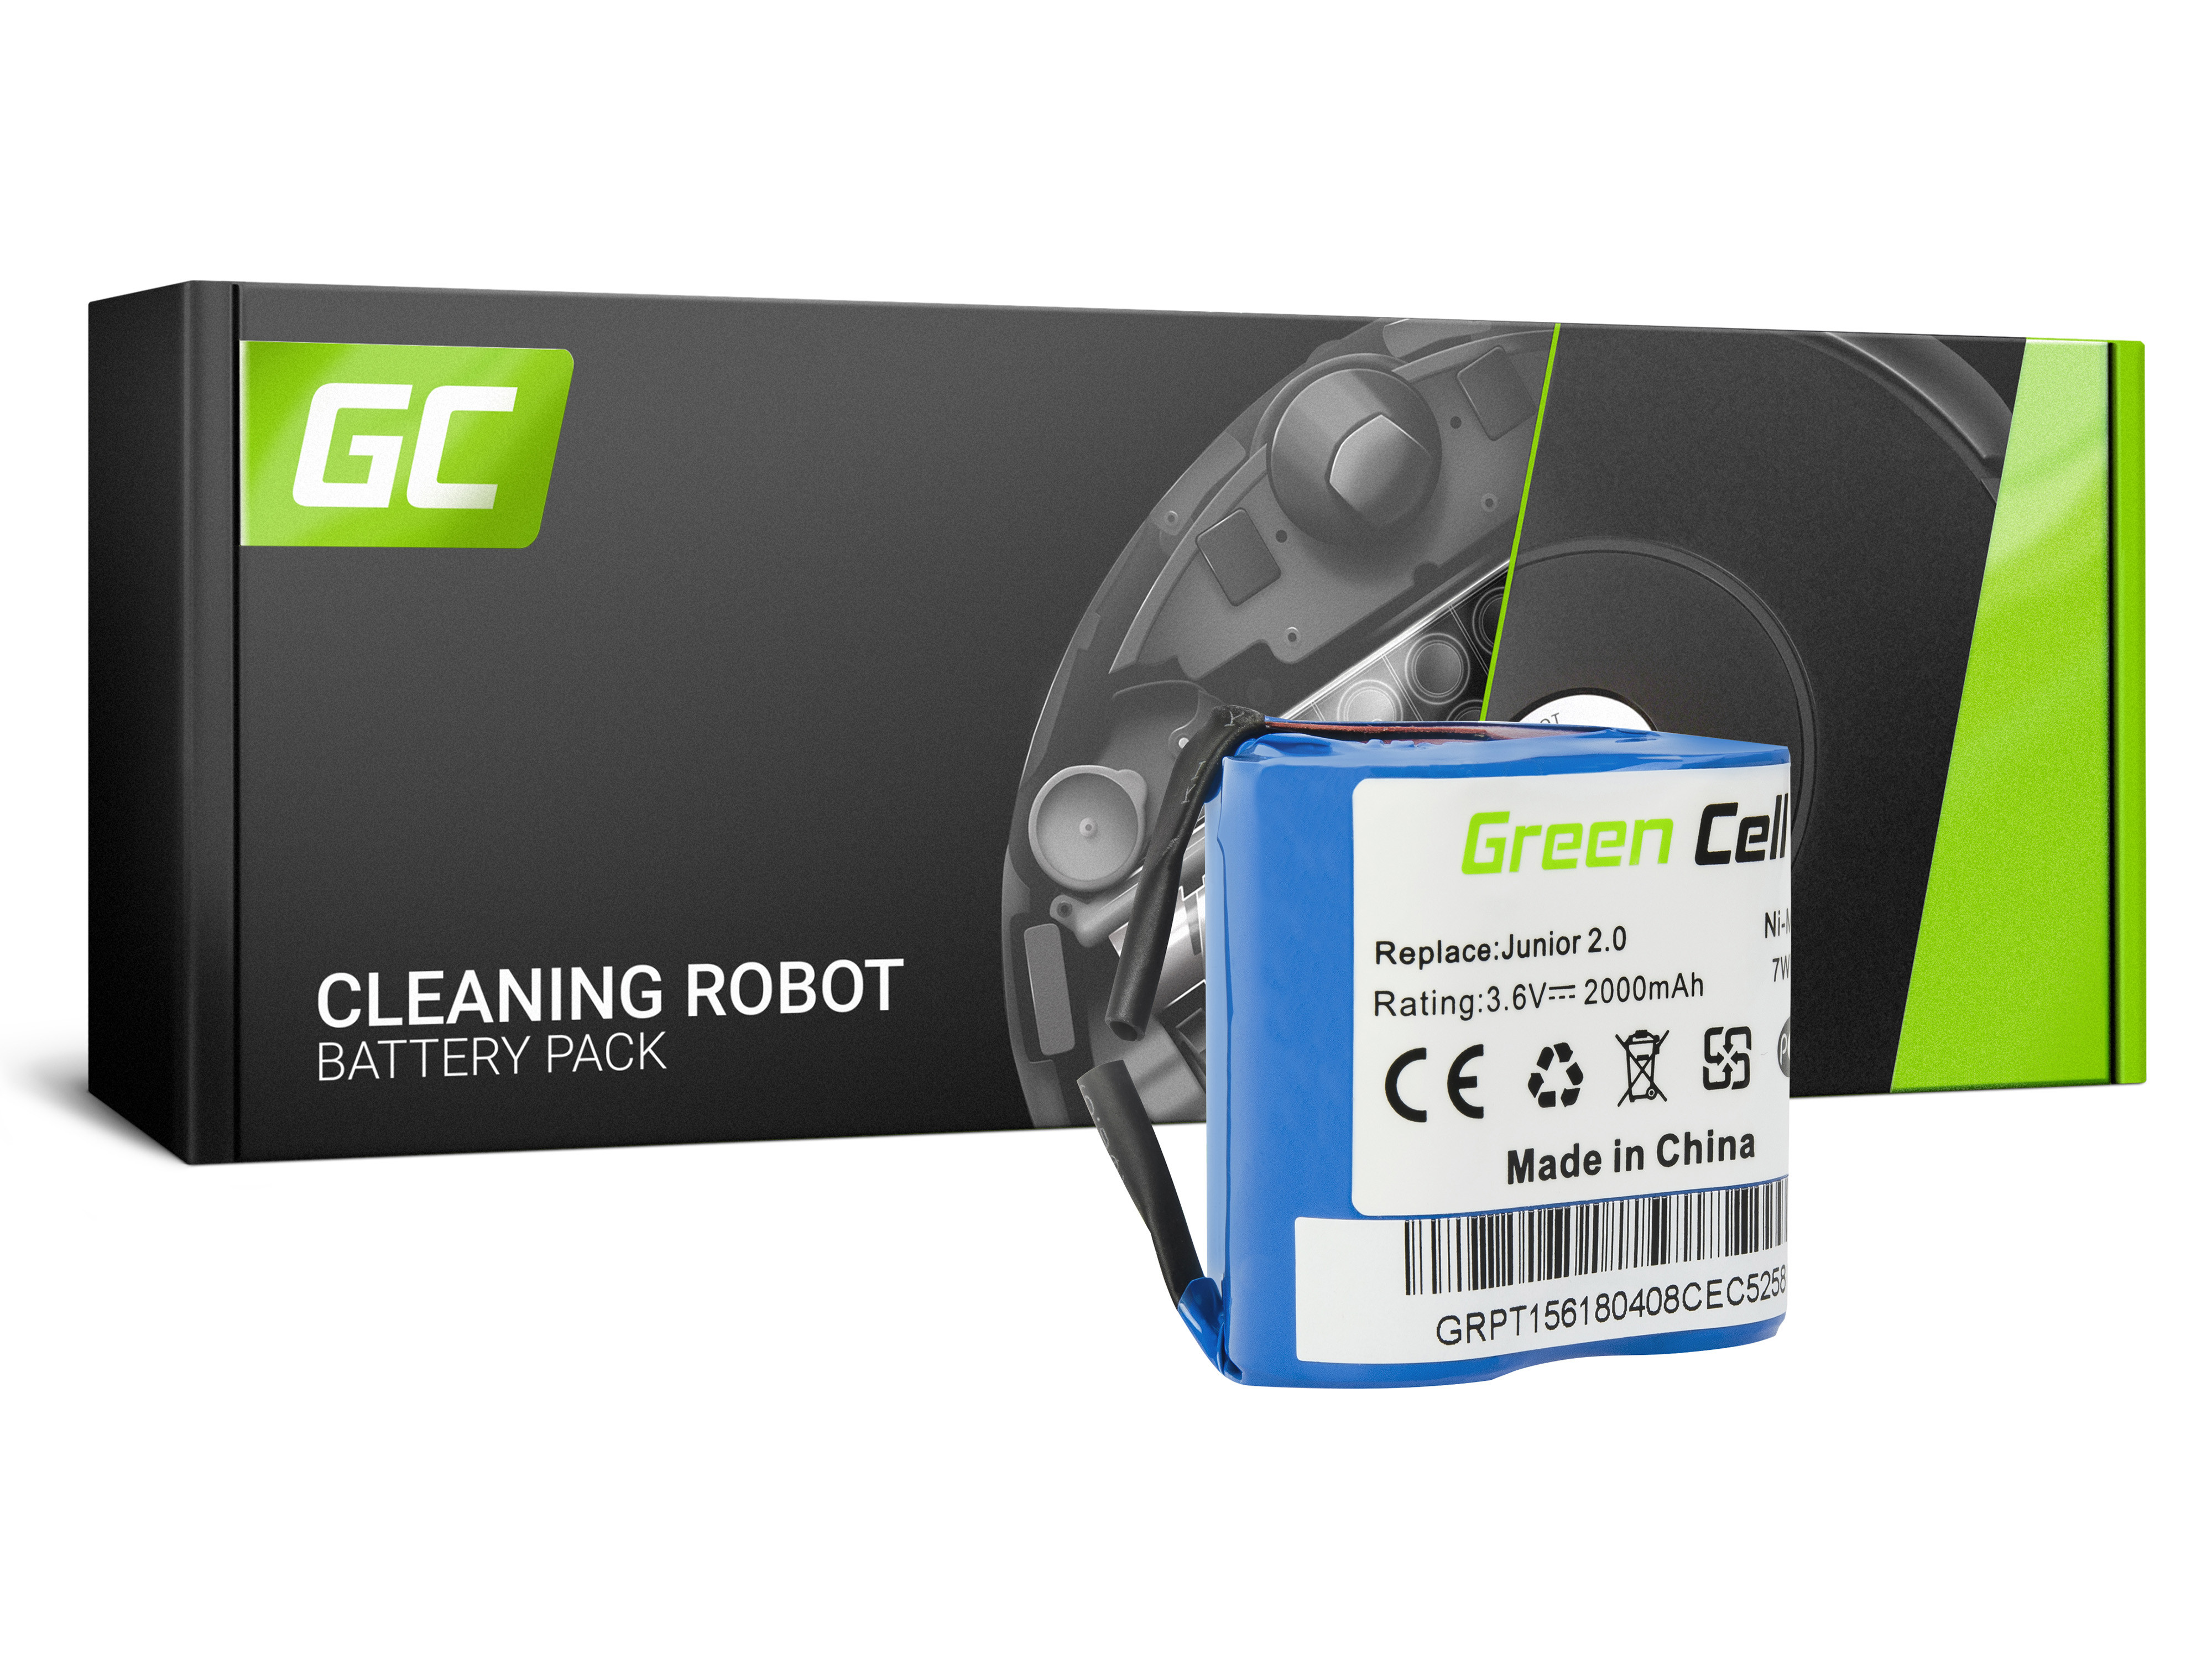 Baterie Green Cell Electrolux Type141 AEG Electrolux Junior 2.0 3.6V 2000mAh Ni-MH – neoriginální